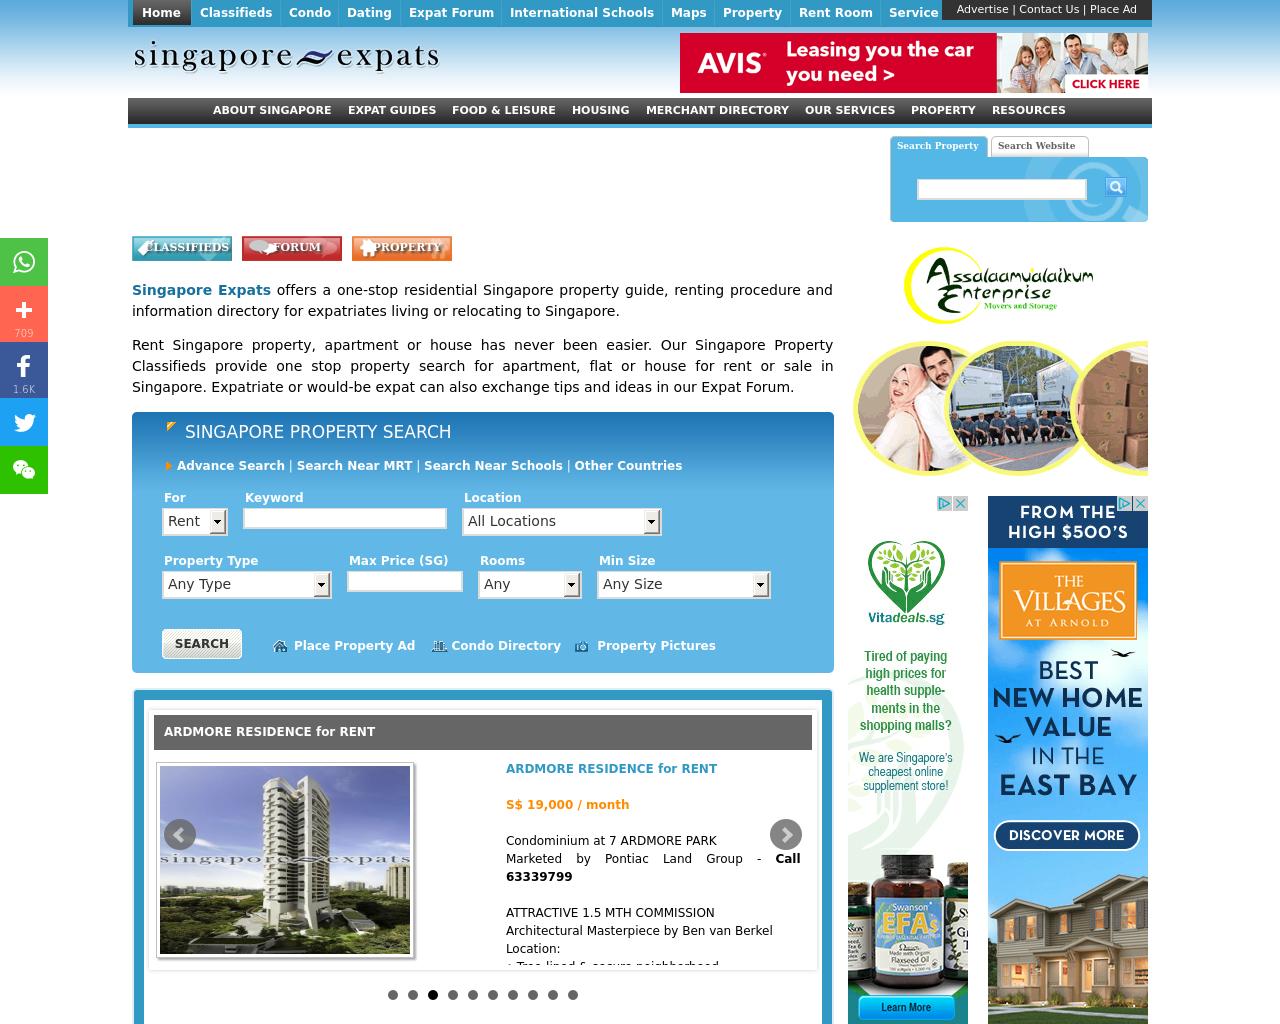 Singapore-Expats-Advertising-Reviews-Pricing